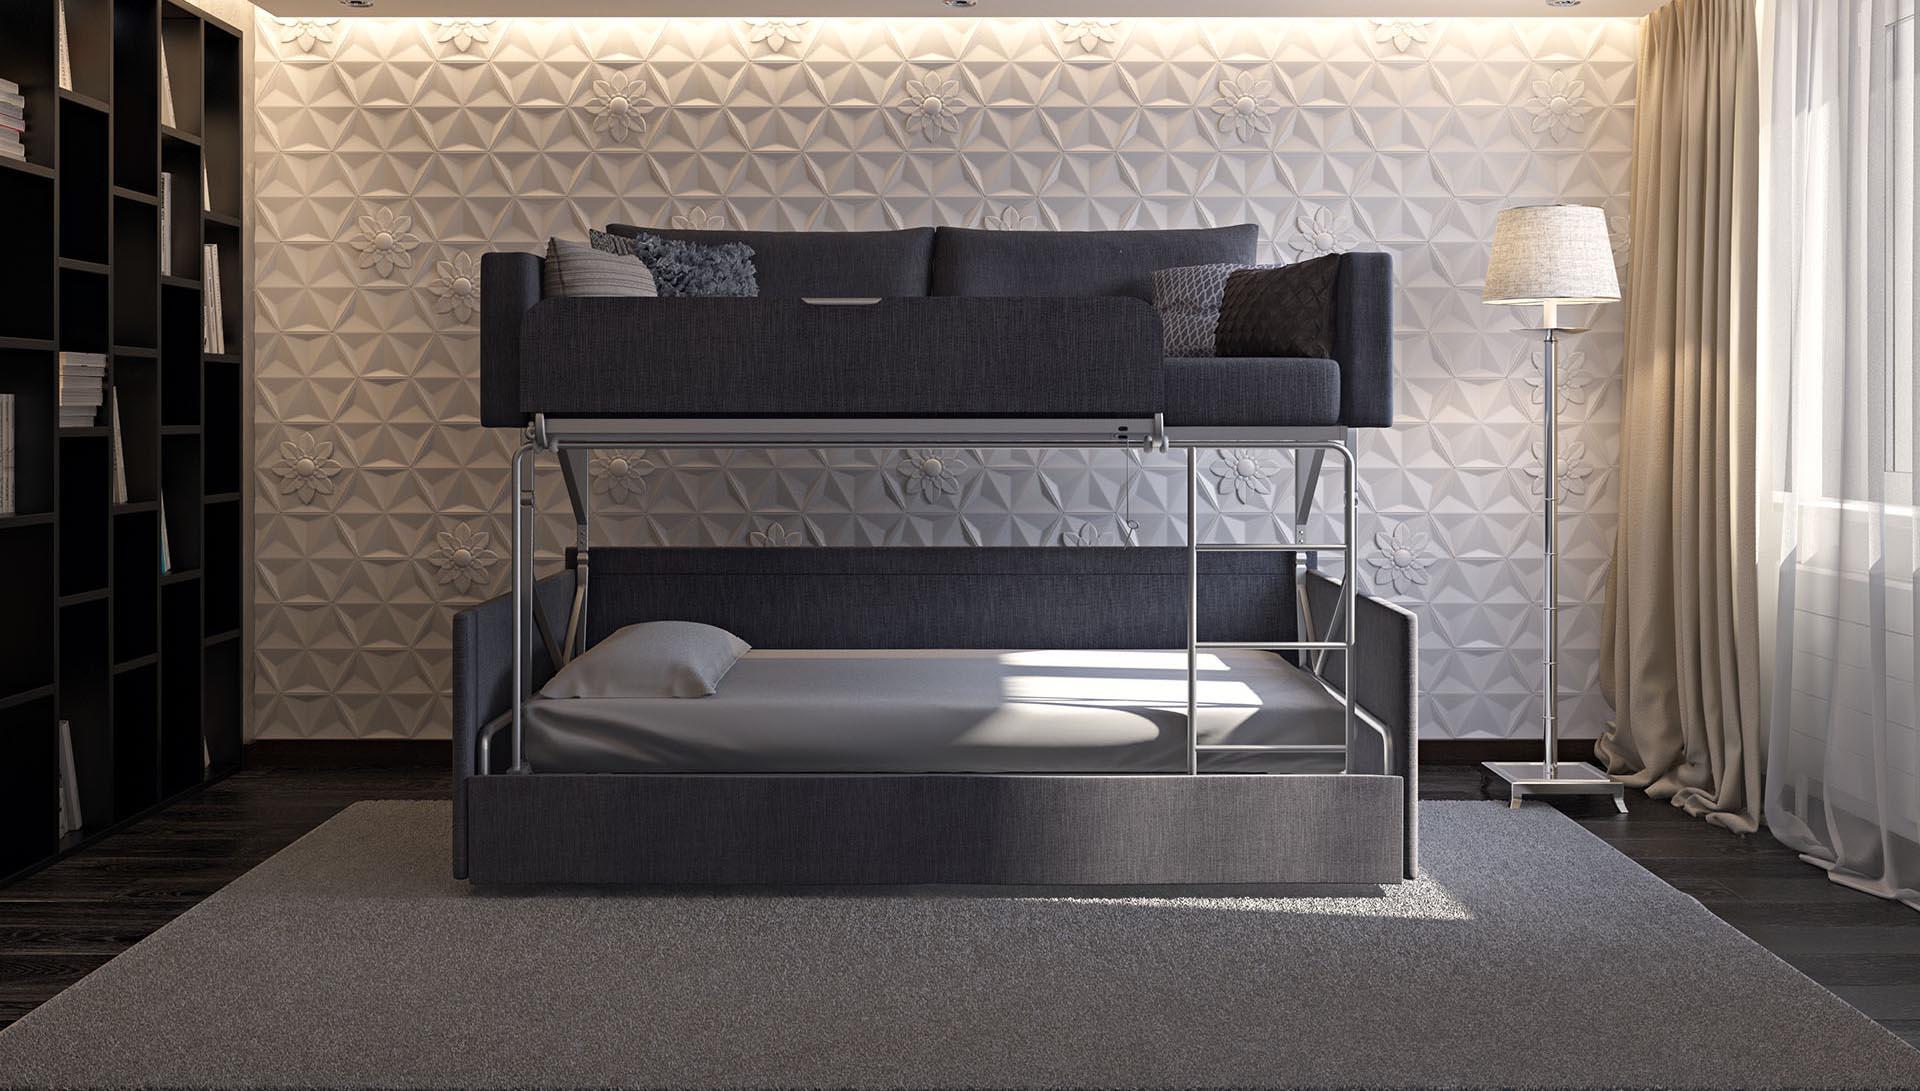 Excellent This Sofa Converts To A Bunk Bed Small Space Dwellers Inzonedesignstudio Interior Chair Design Inzonedesignstudiocom